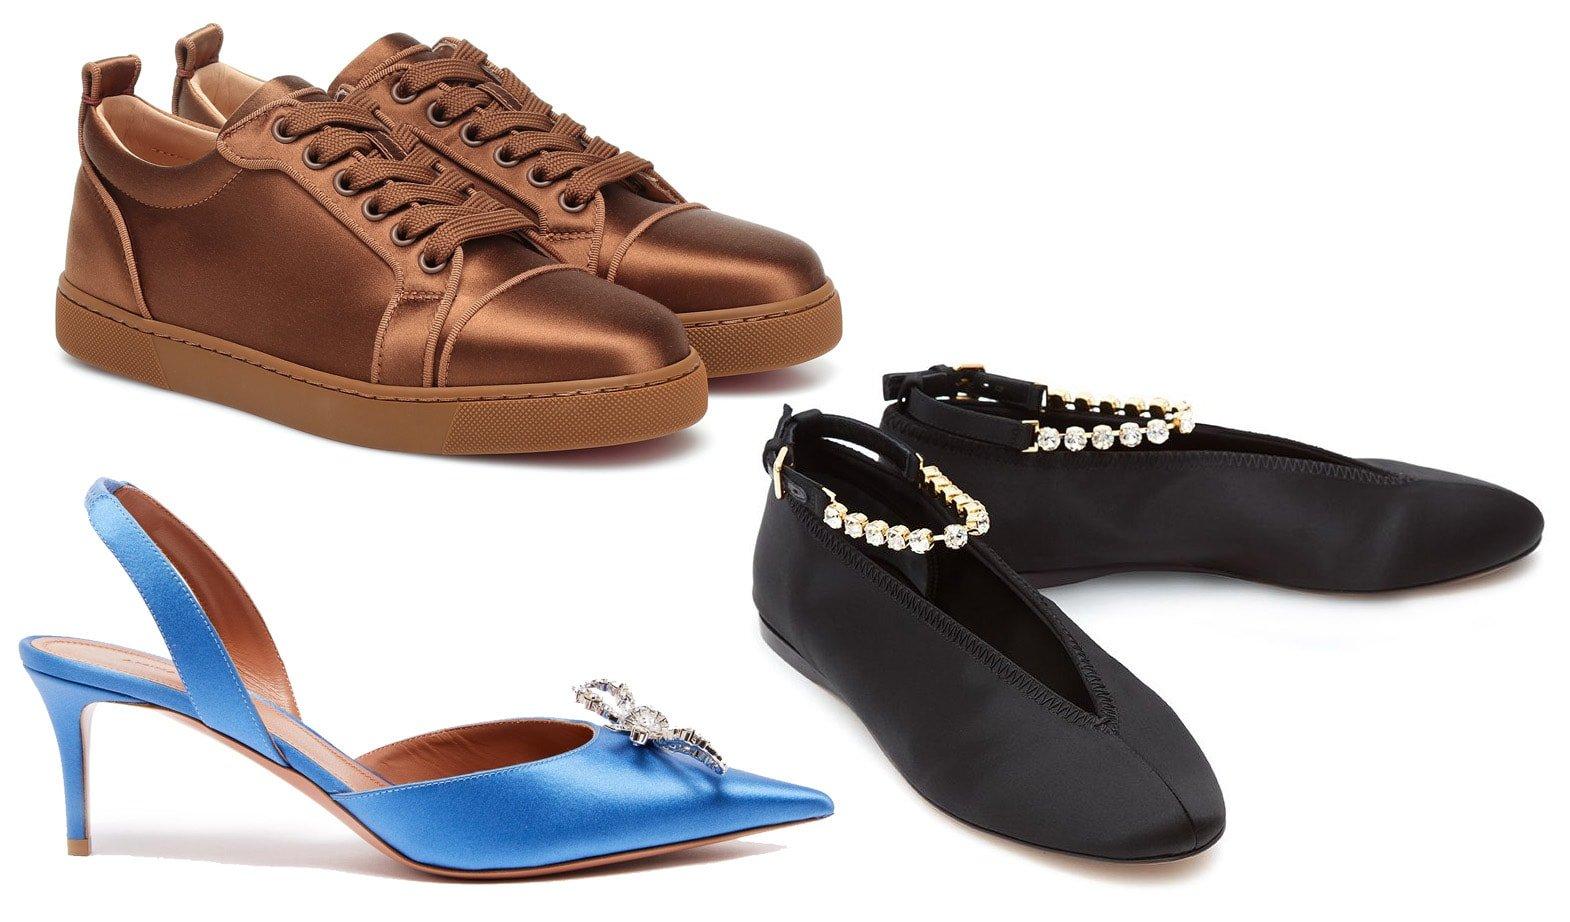 Christian Louboutin Louis Junior silk-satin sneakers, Amina Muaddi BlueRosie crystal-embellished silk-satin pumps, JW Anderson crystal-embellished Silk Ballerina shoes